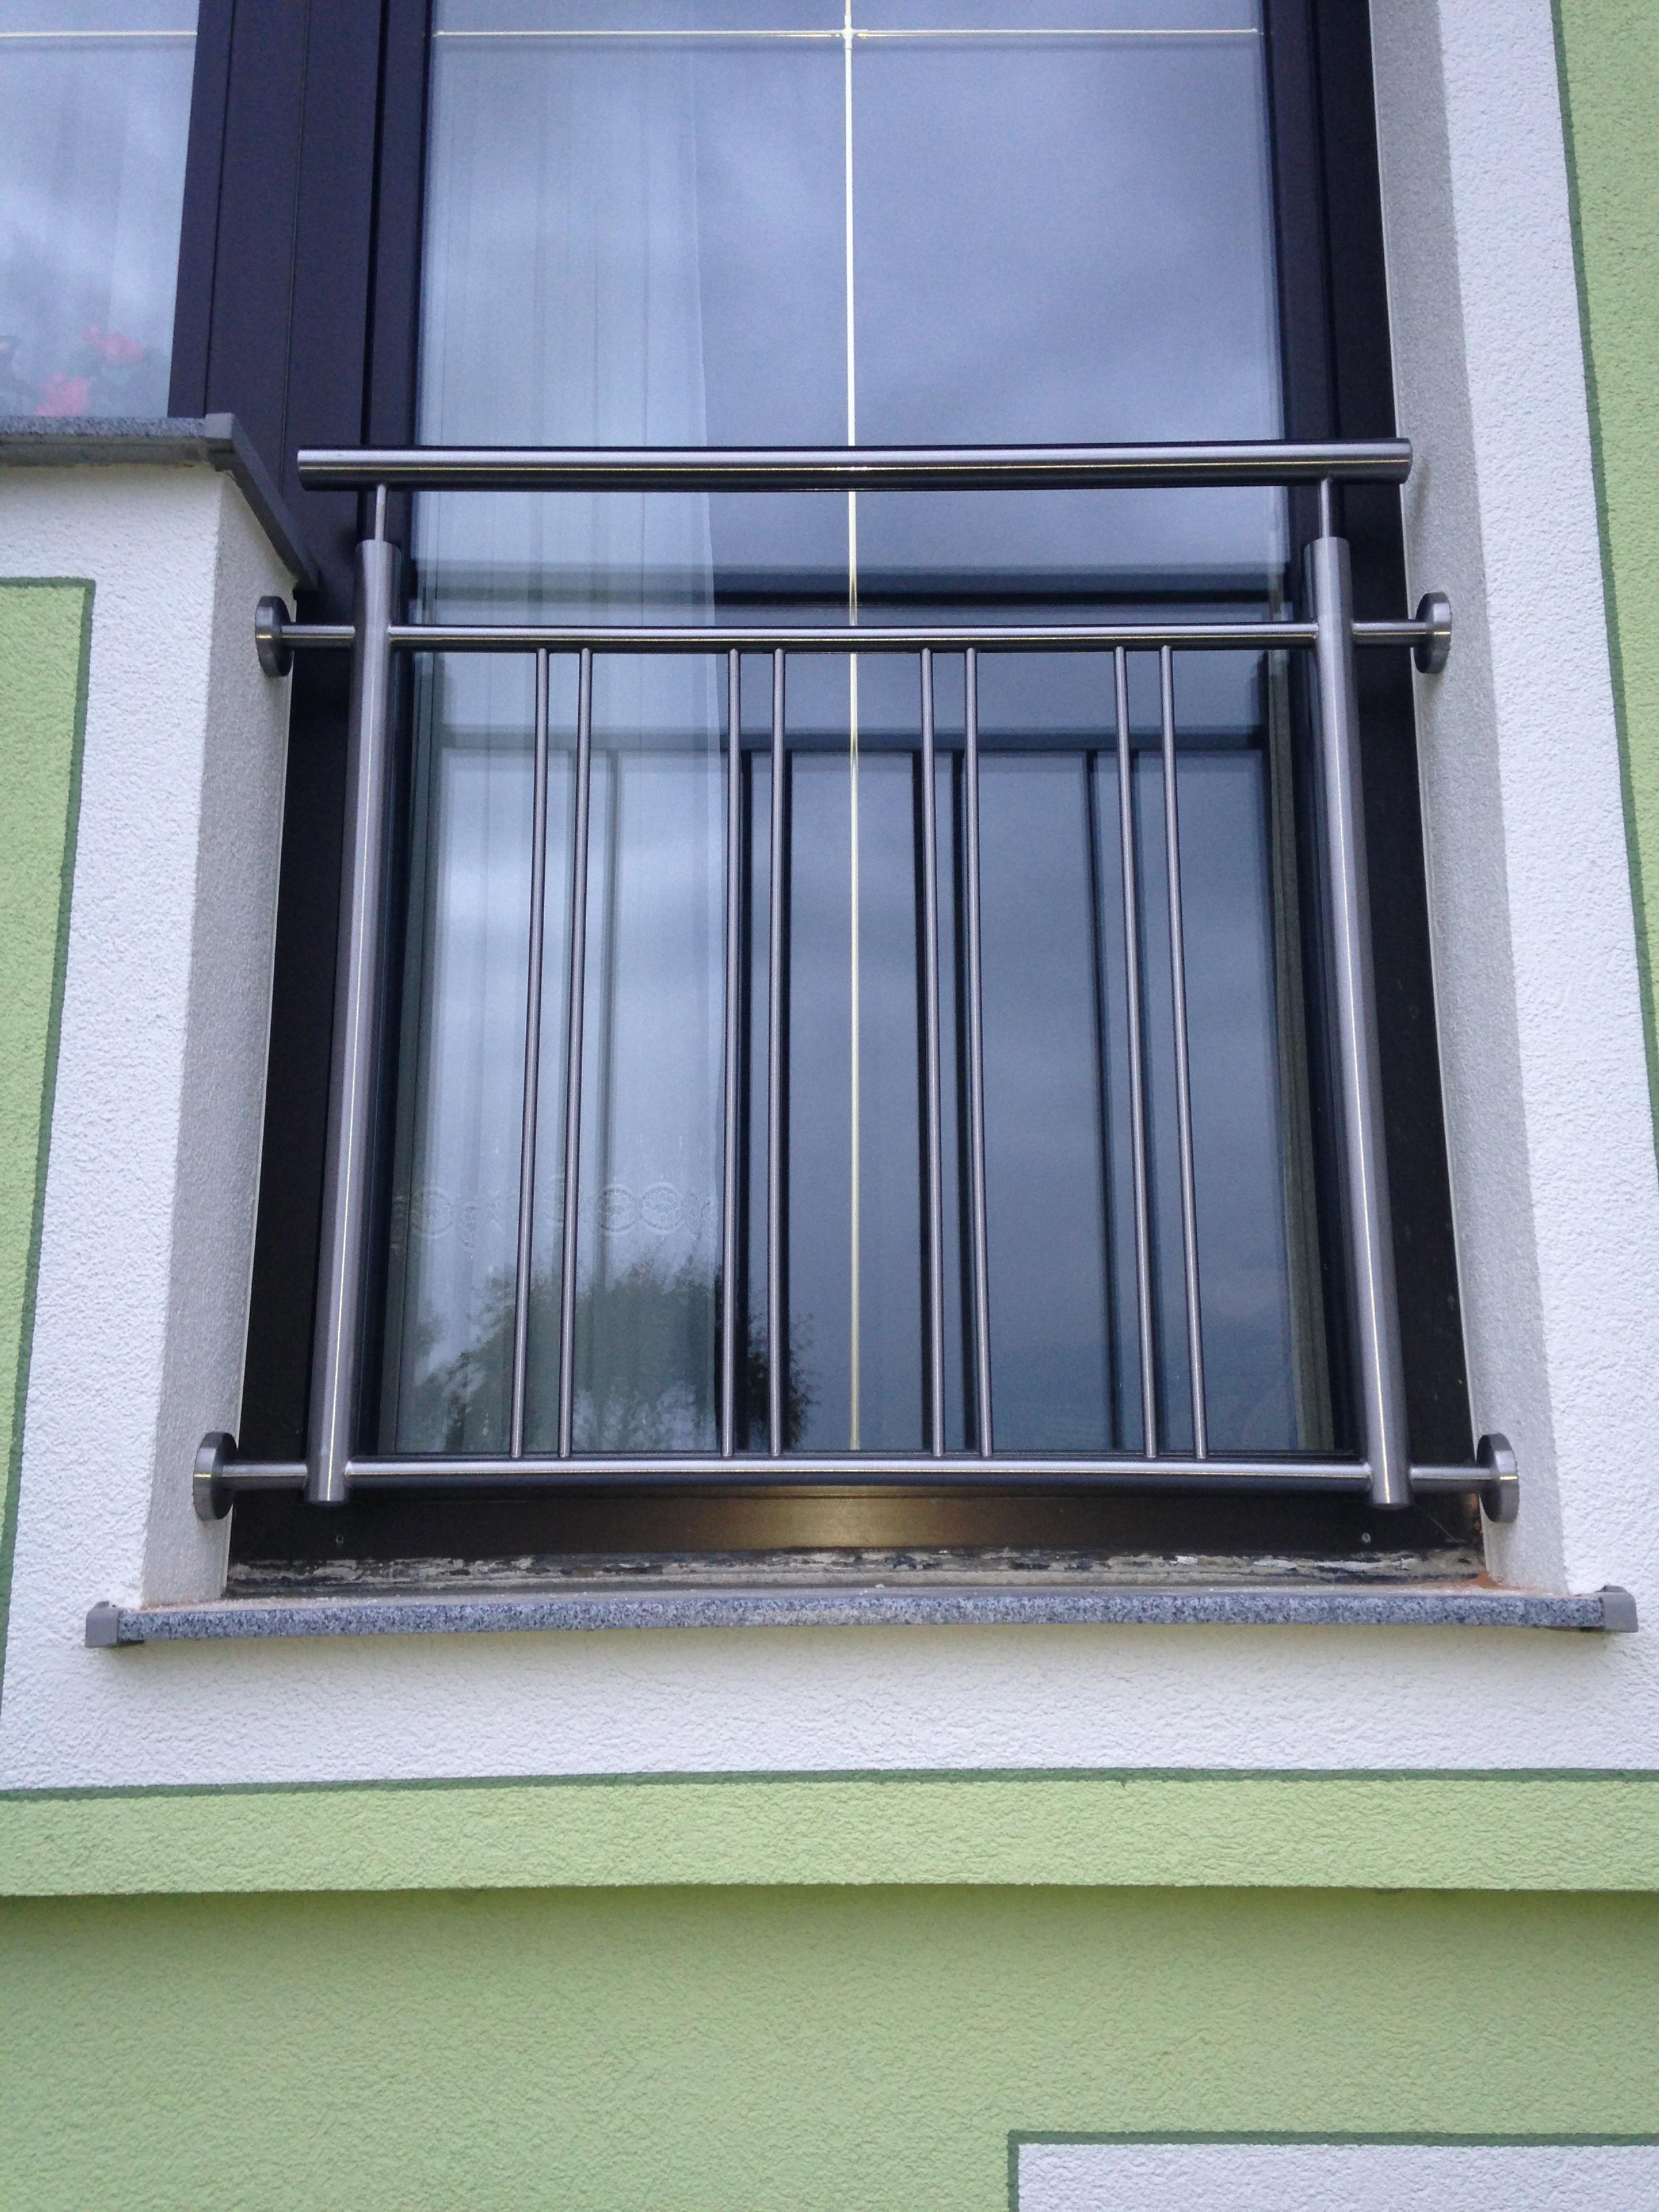 Französische Fenster französische fenster aus edelstahl | edelstahlgelander.at